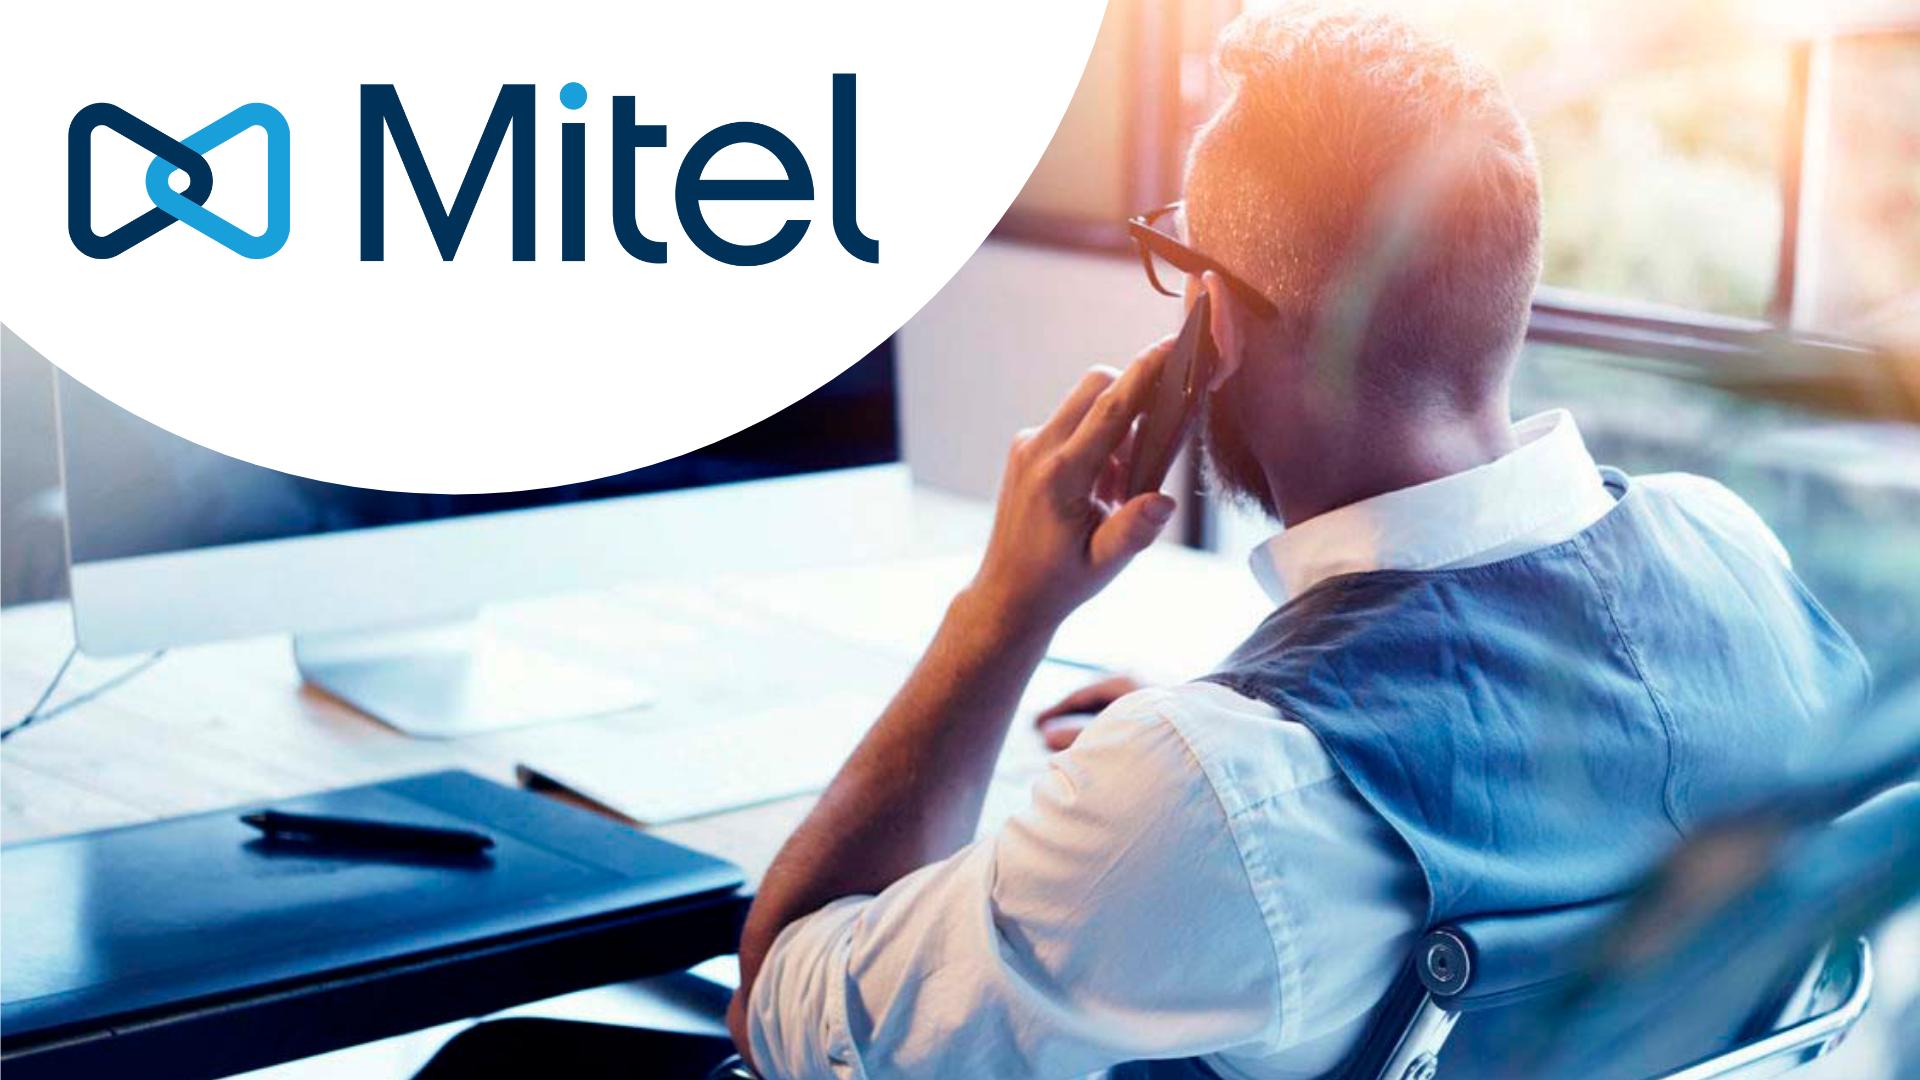 Mitel VoIP Phones